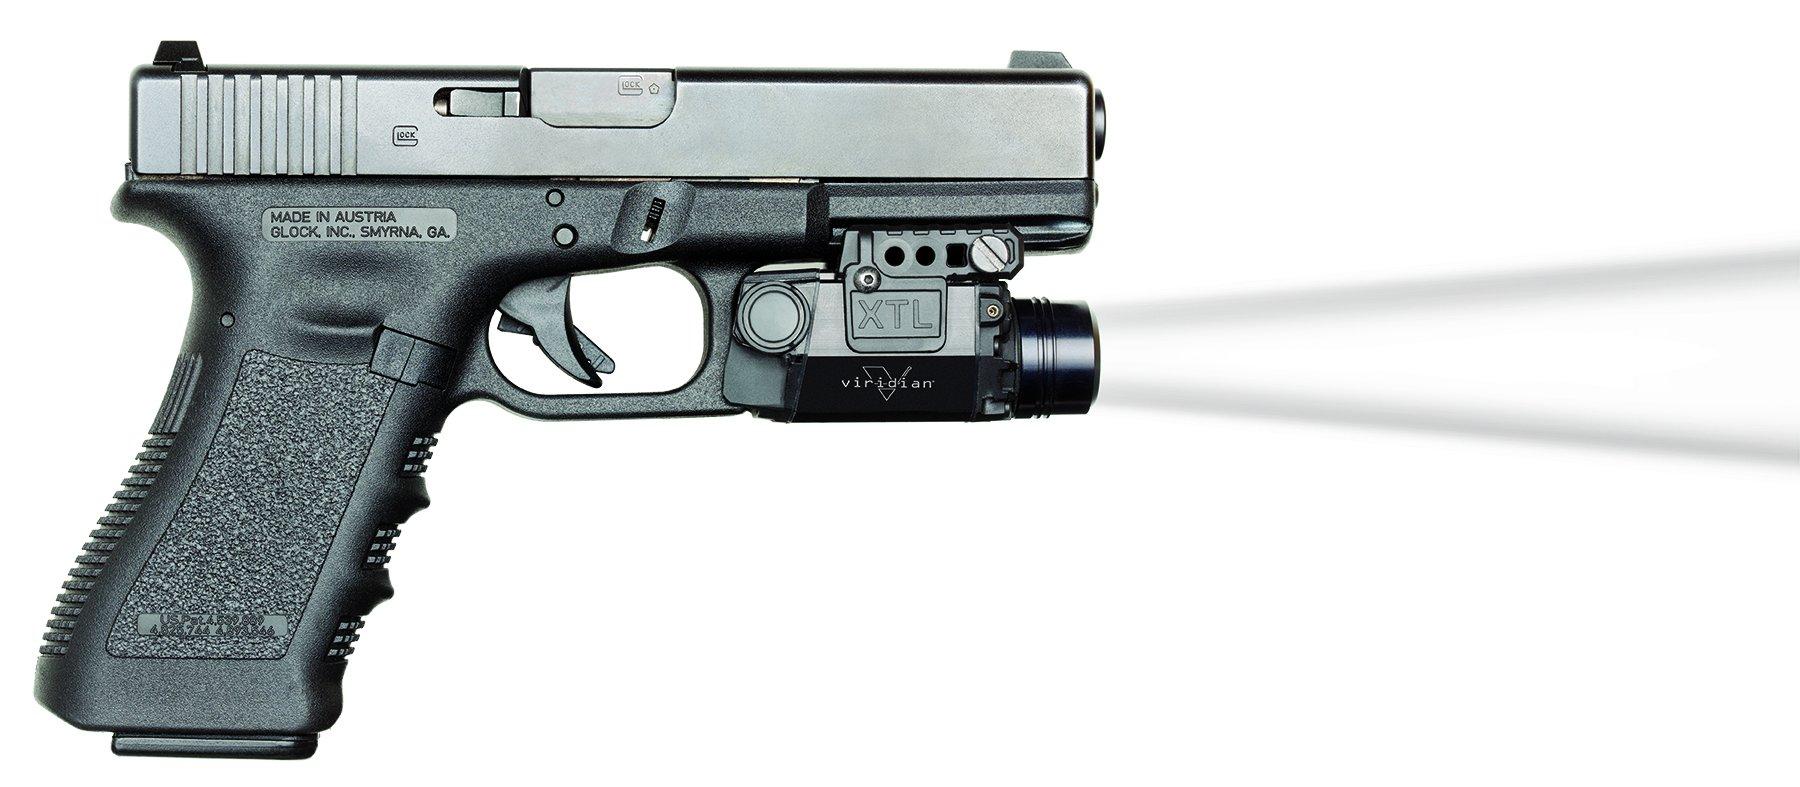 Viridian Universal Mount Tactical Light w/ Strobe (338/418 Lumens) featuring ECR